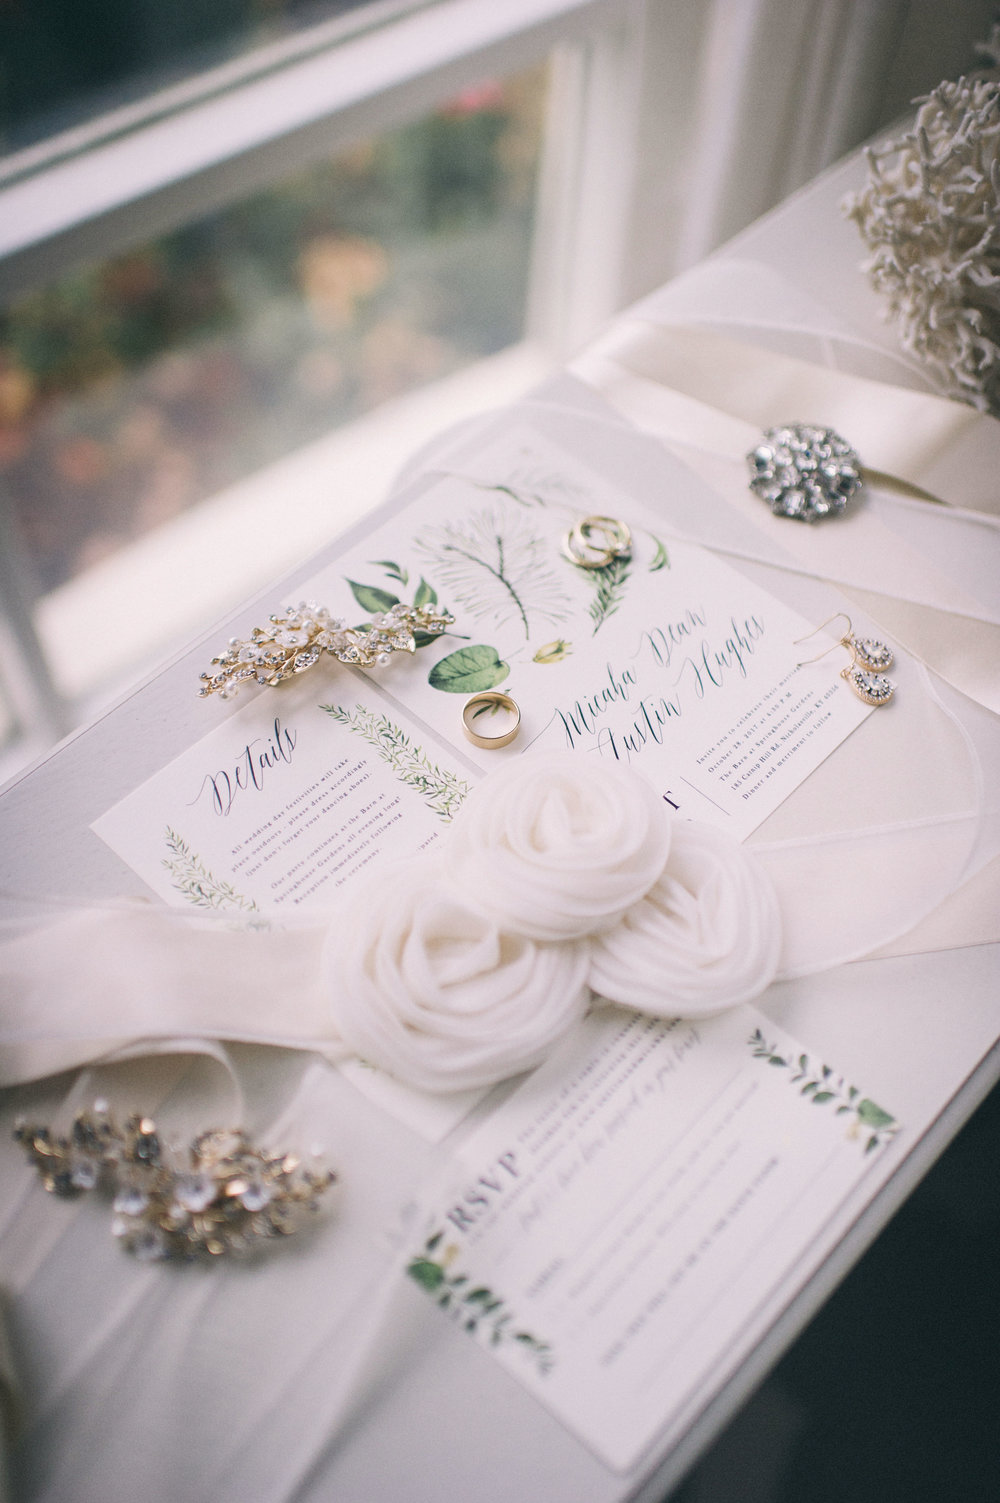 Micaha & Austin // Cozy Autumn Wedding at Springhouse Gardens // Lexington, Kentucky // Wedding Photography // Invitation and Details